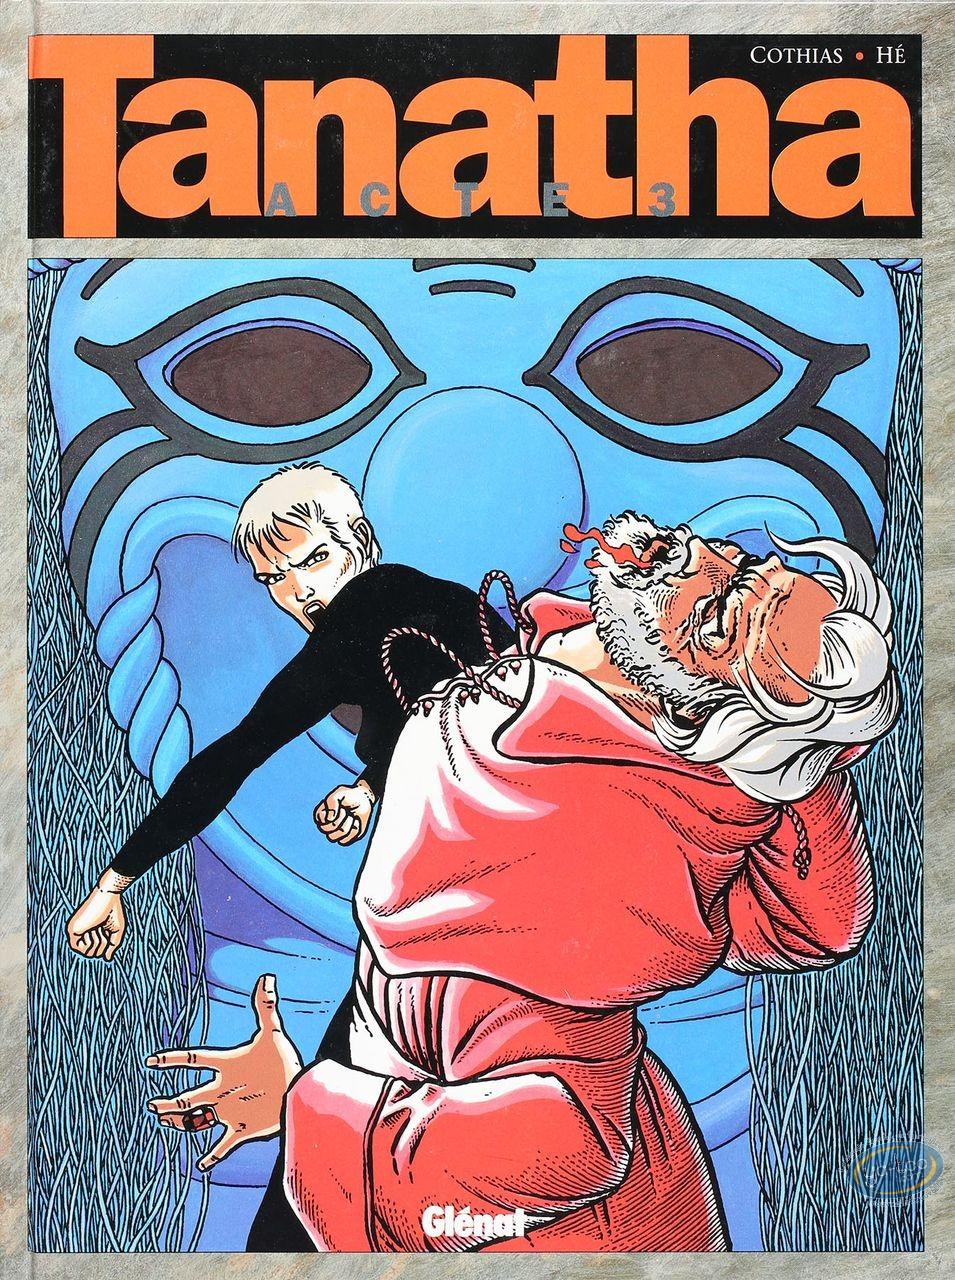 Listed European Comic Books, Tanatha : Acte 3 (very good condition)